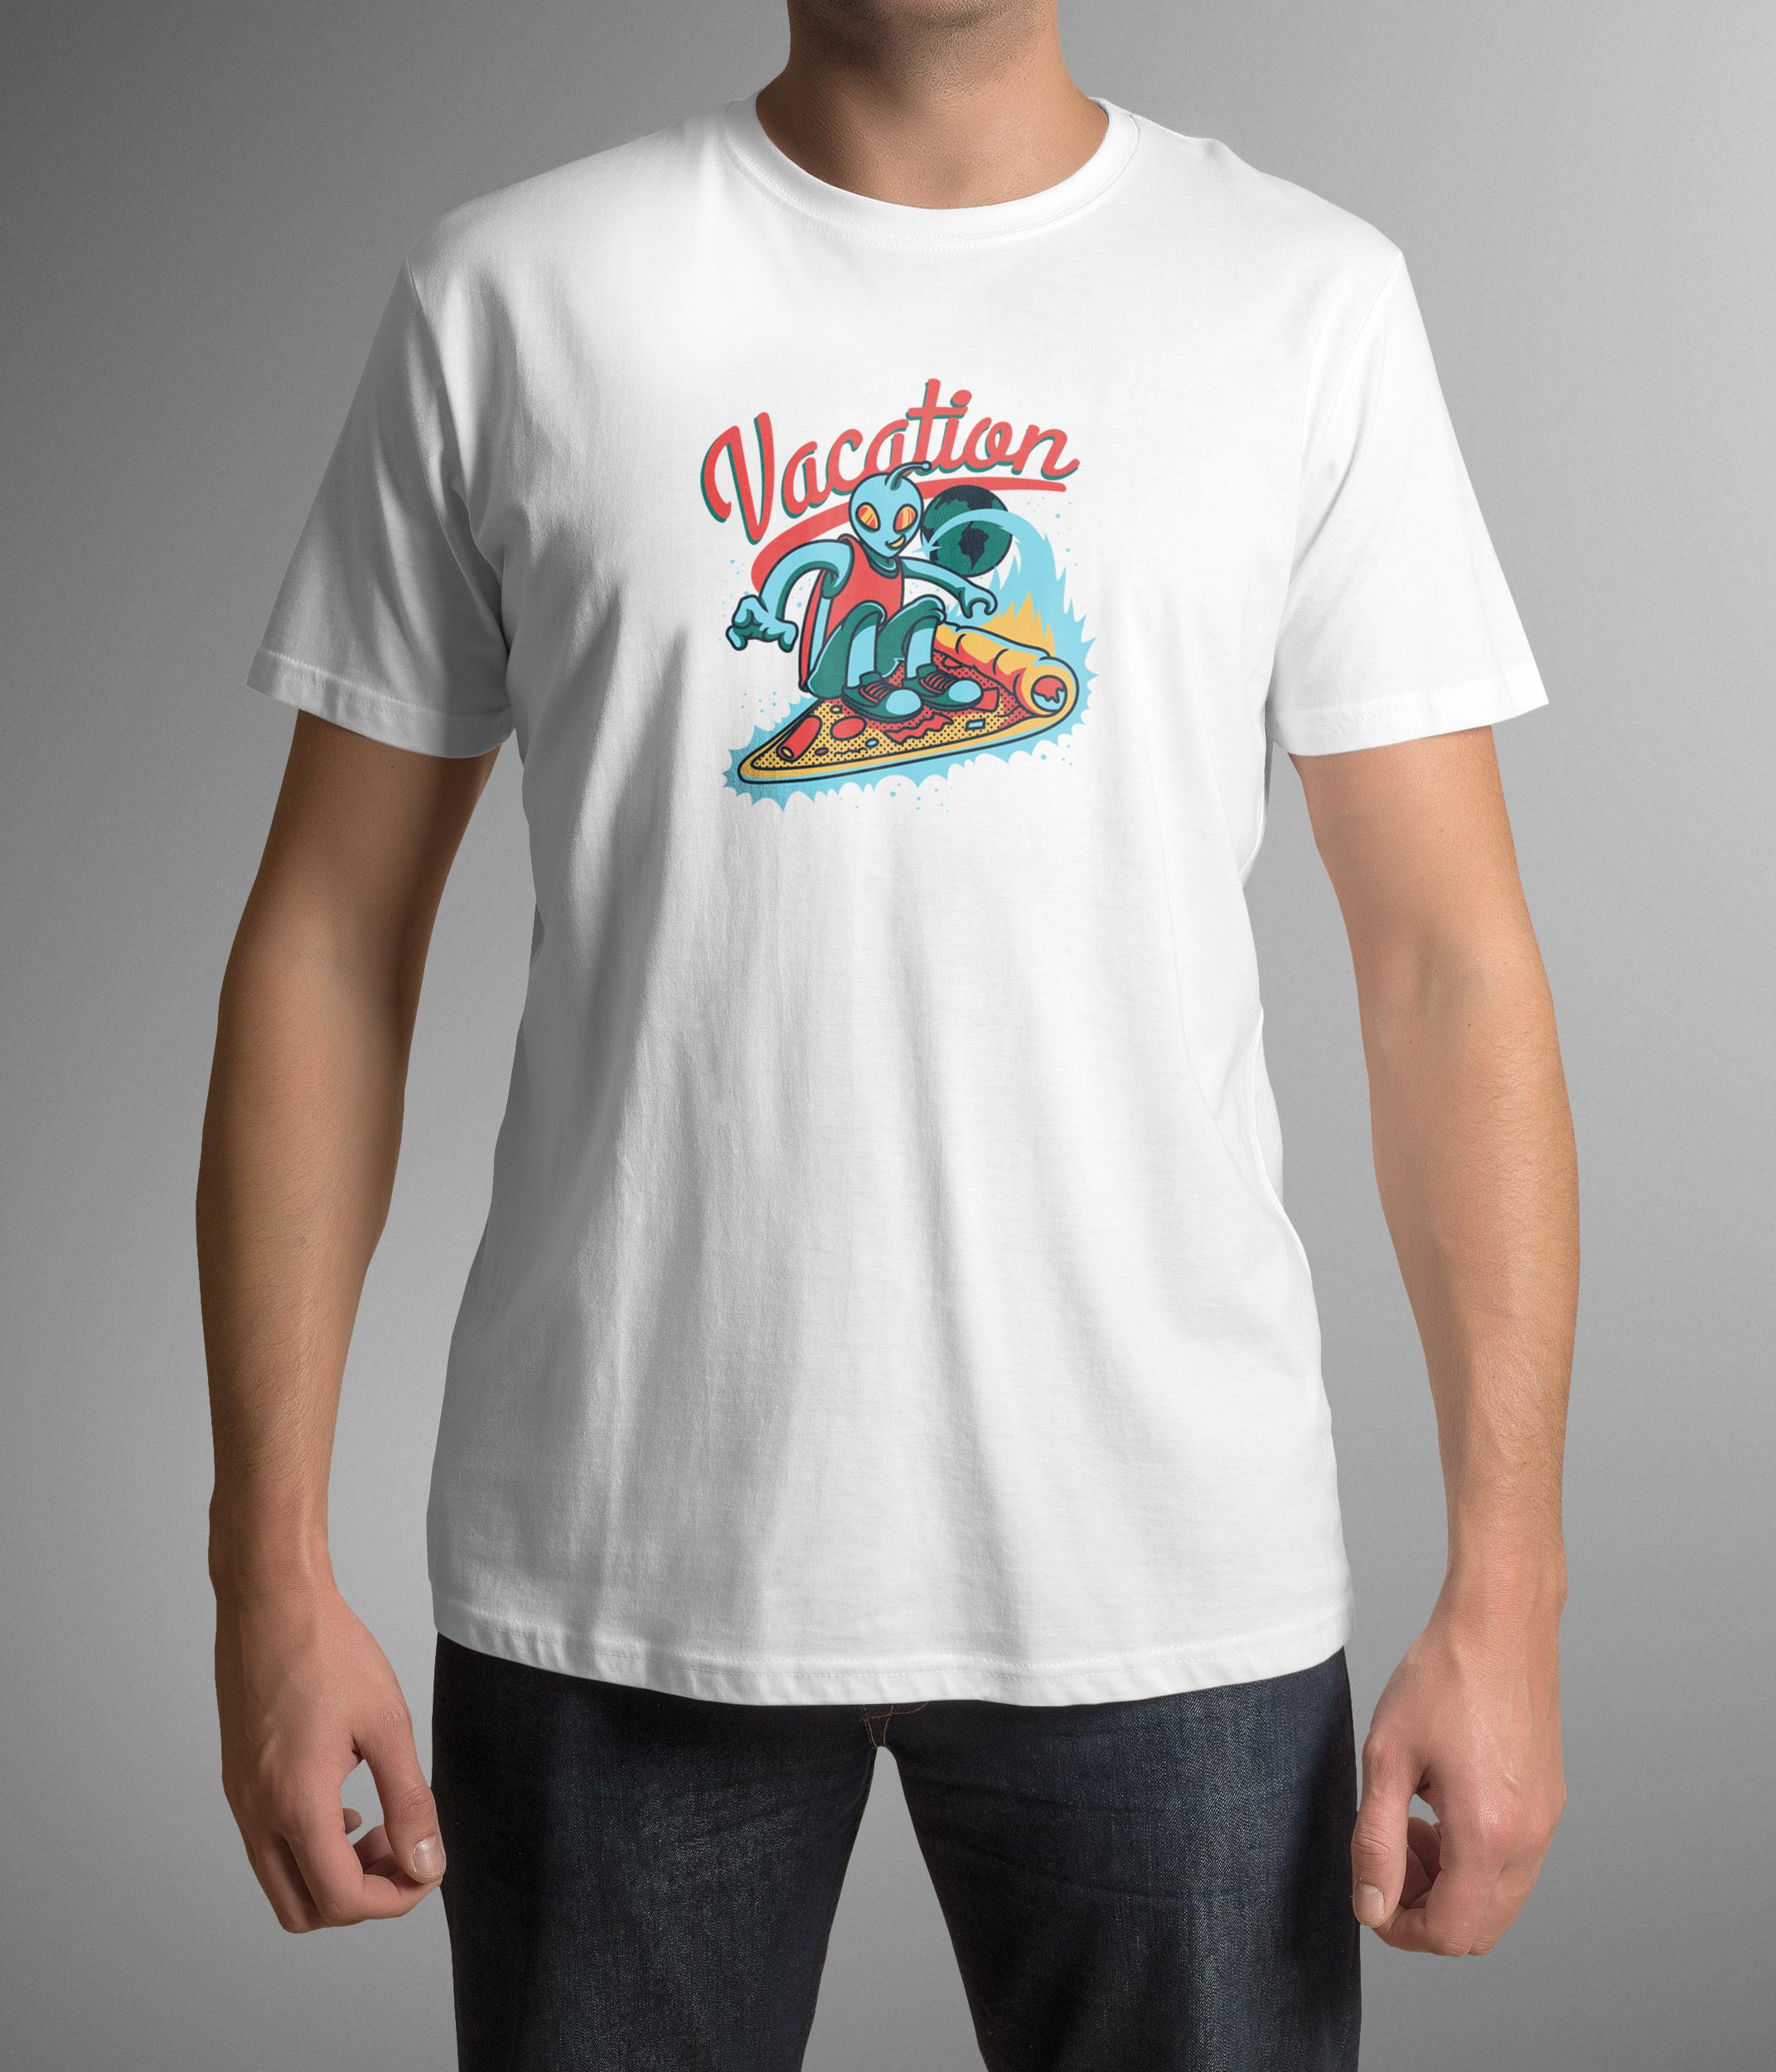 Unisex graphic tshirt alien vacation Etsy in 2020